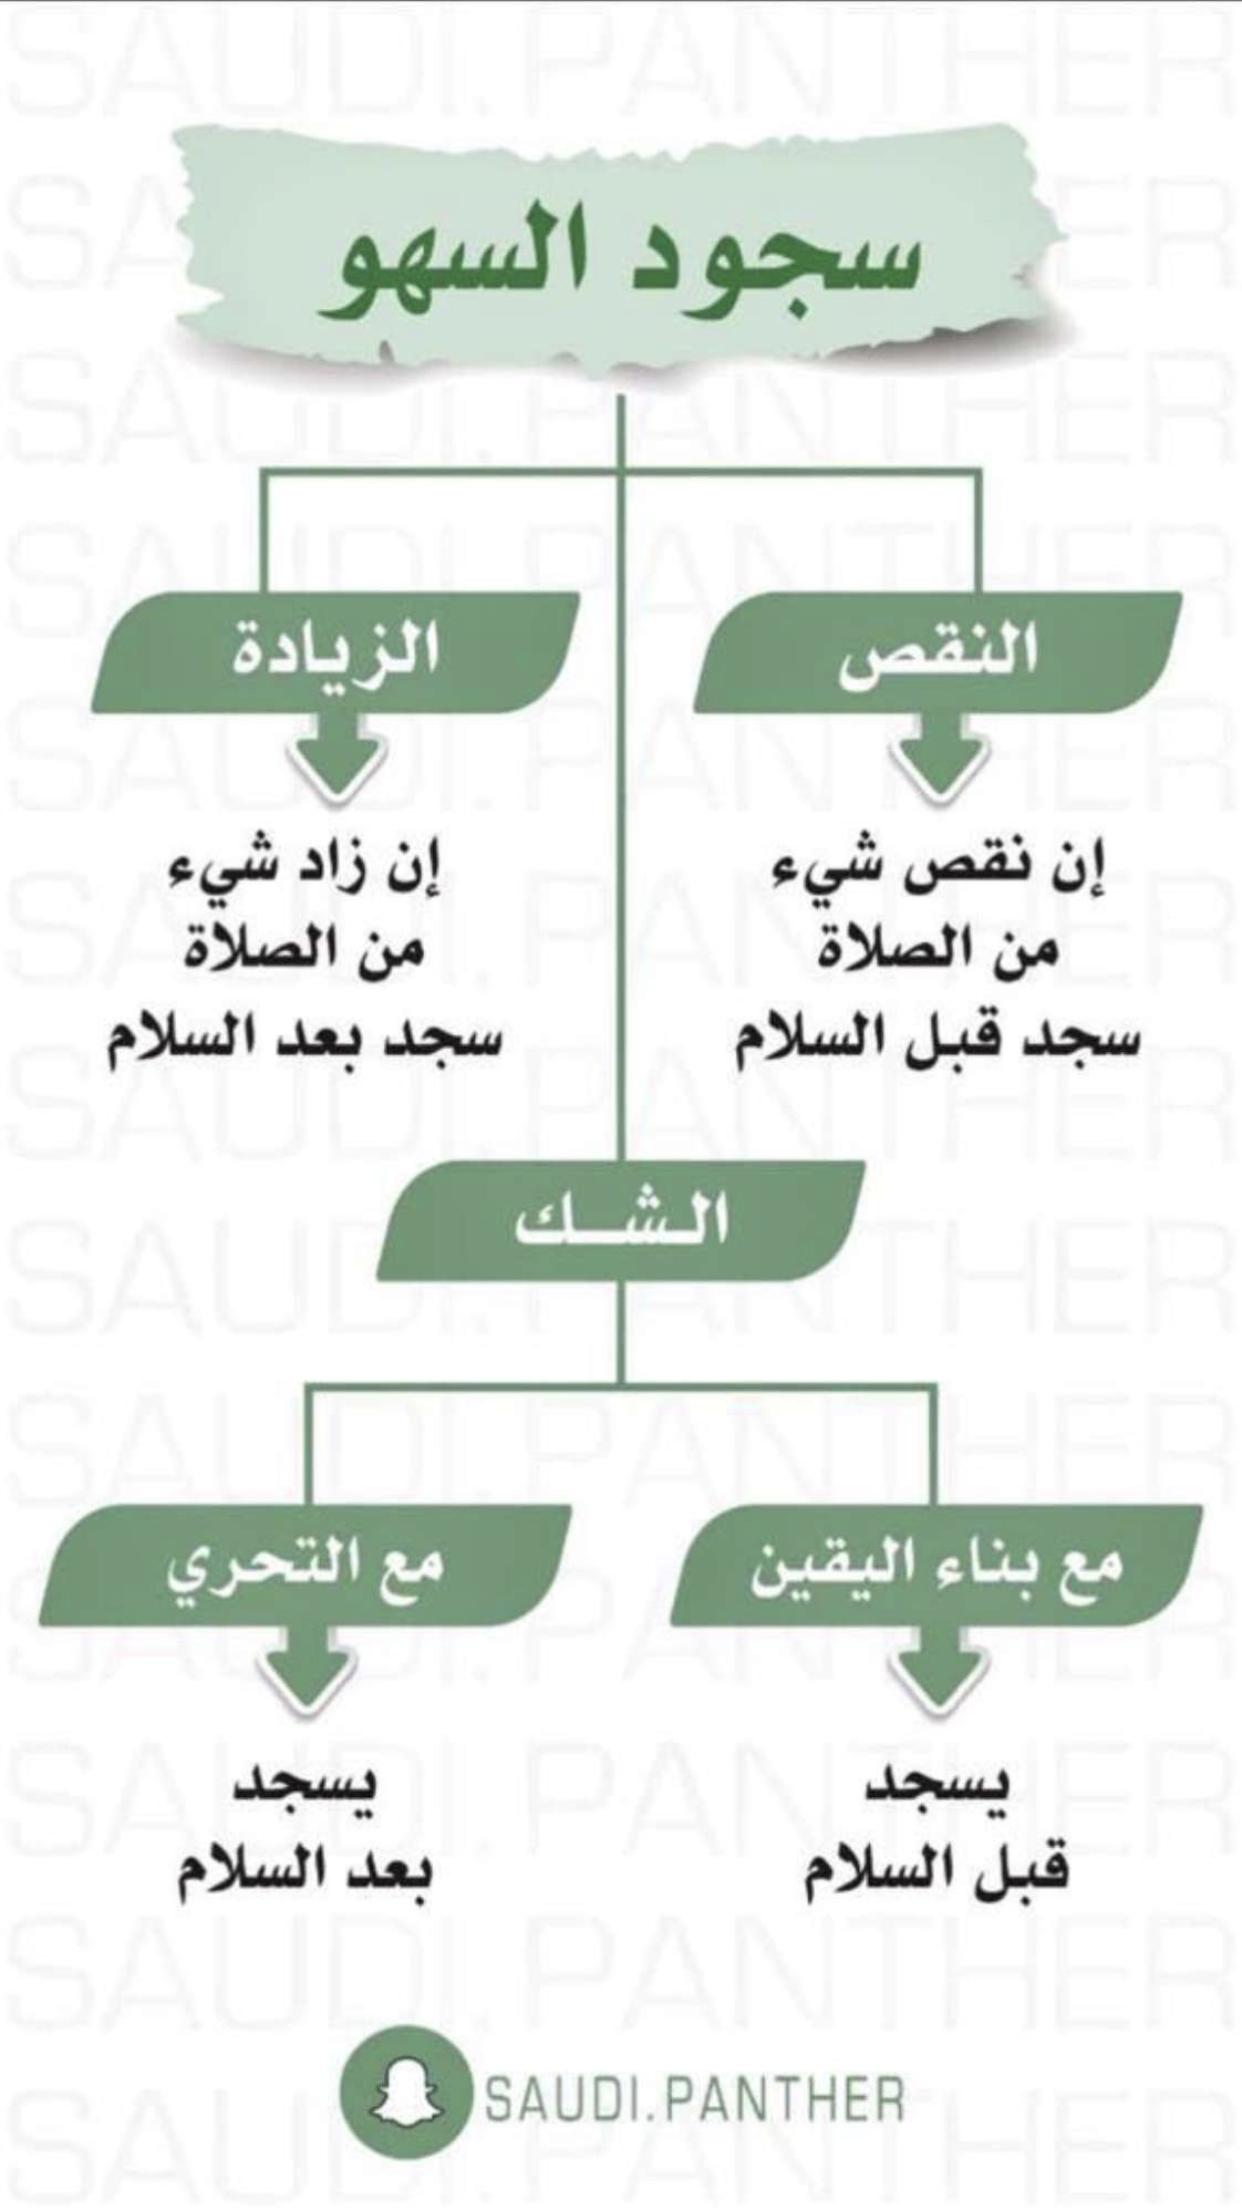 سجود السهو Islam Beliefs Islam Facts Islamic Quotes Quran